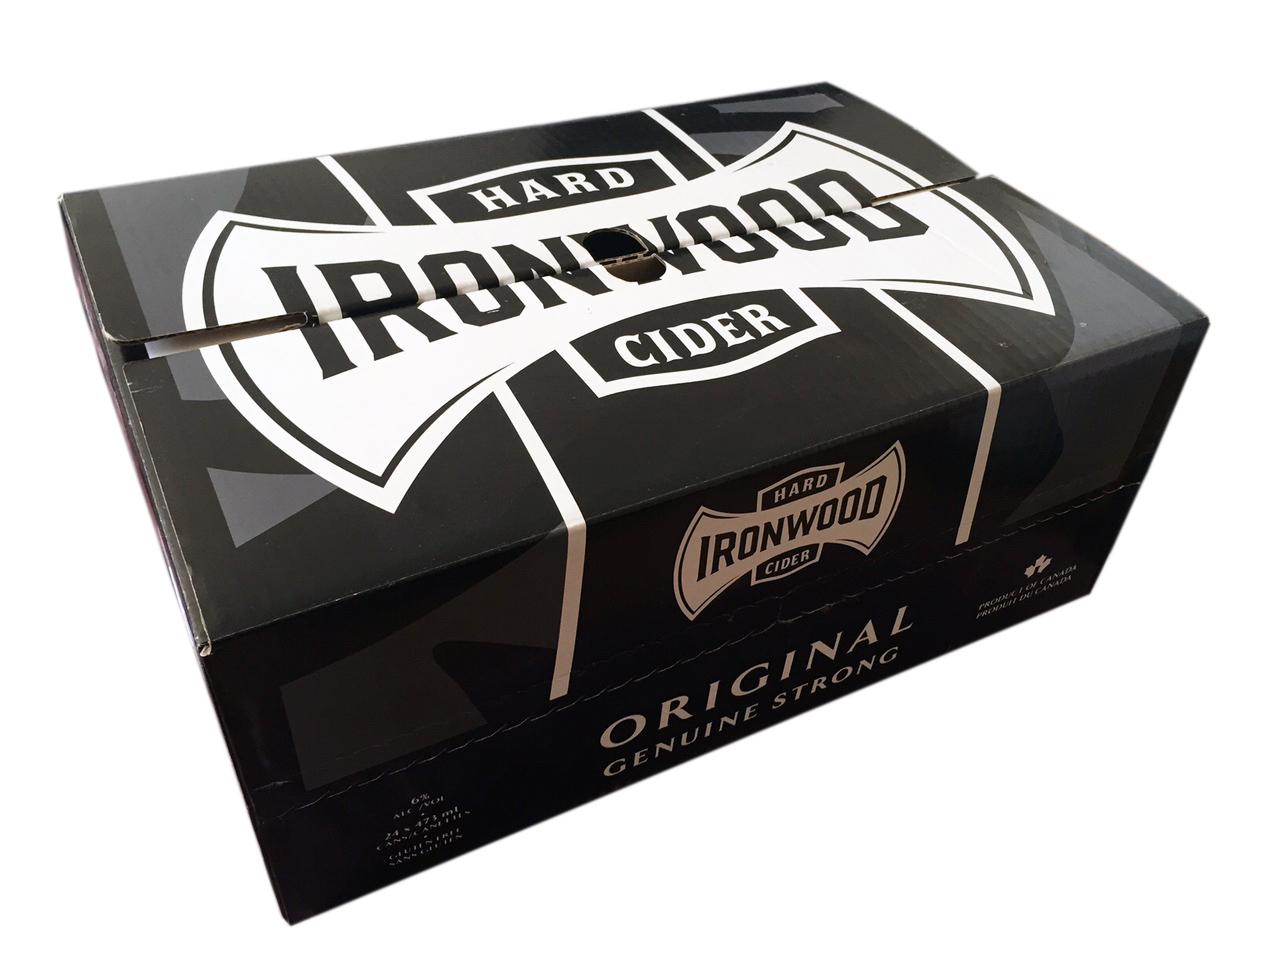 ironwood-cider-24-case.jpg